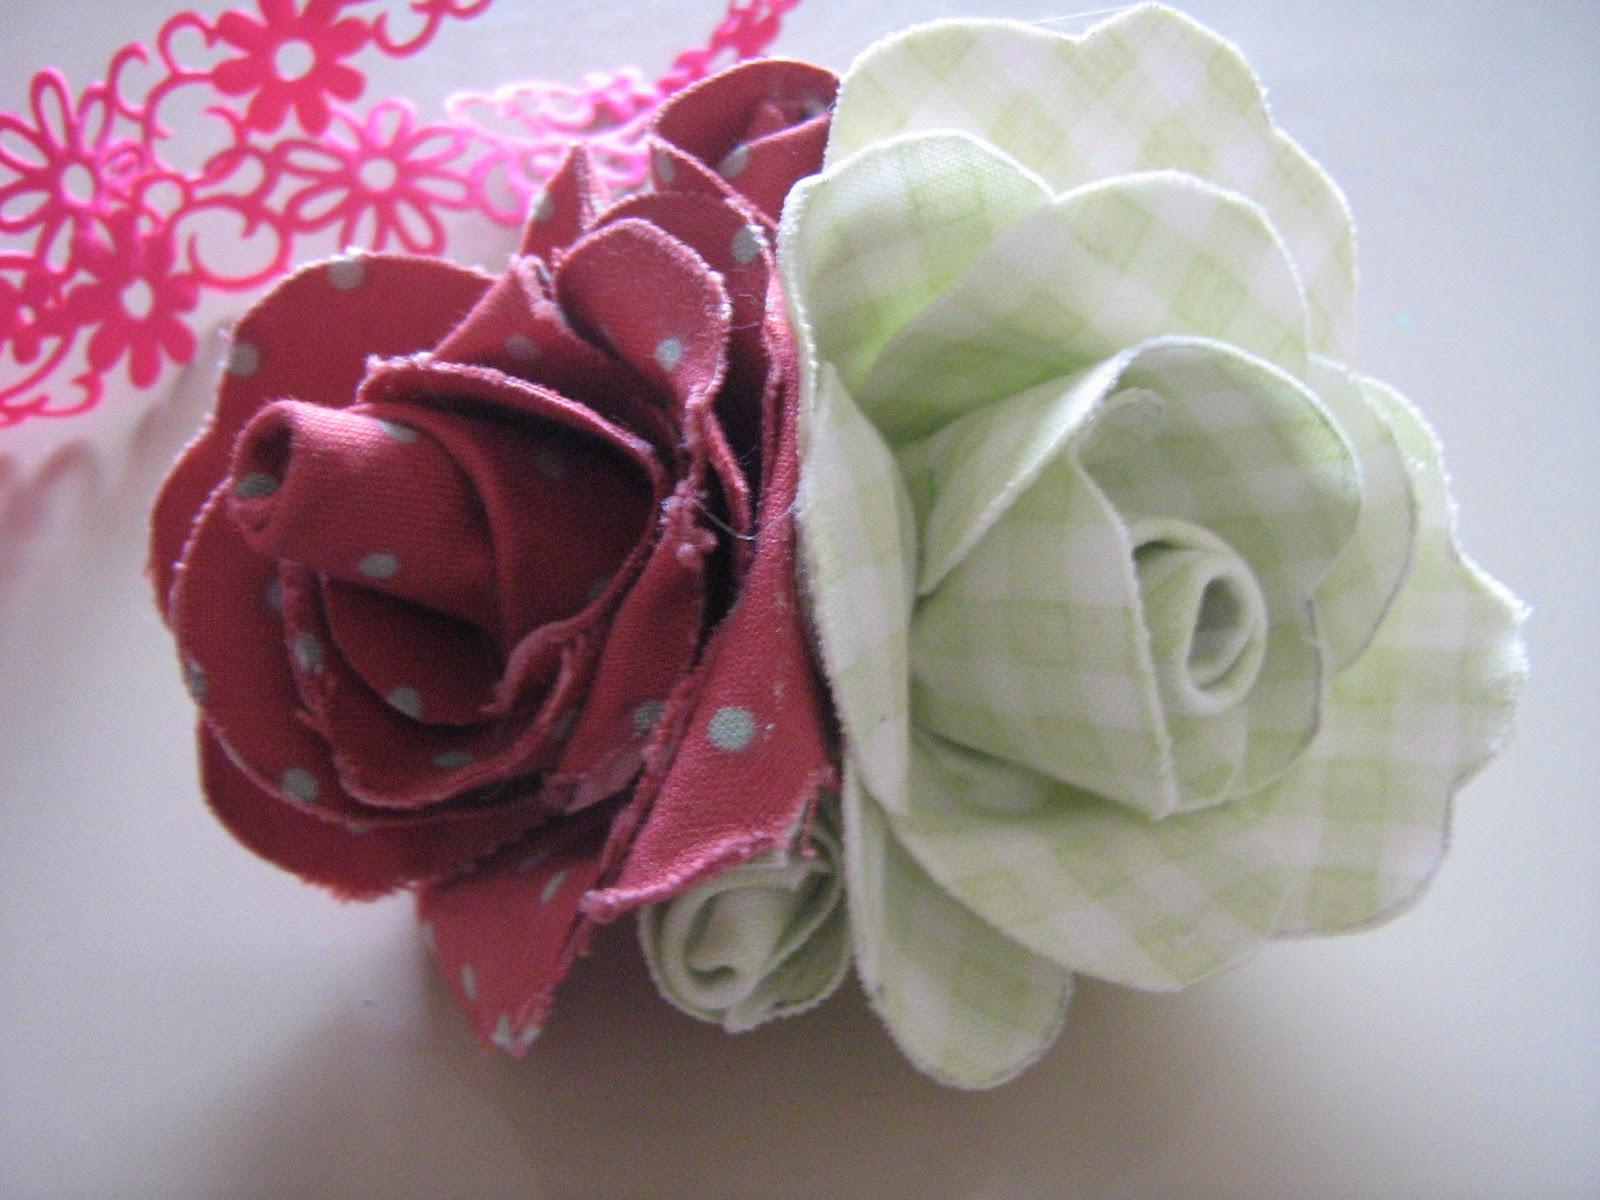 Rose di stoffa fatte a mano